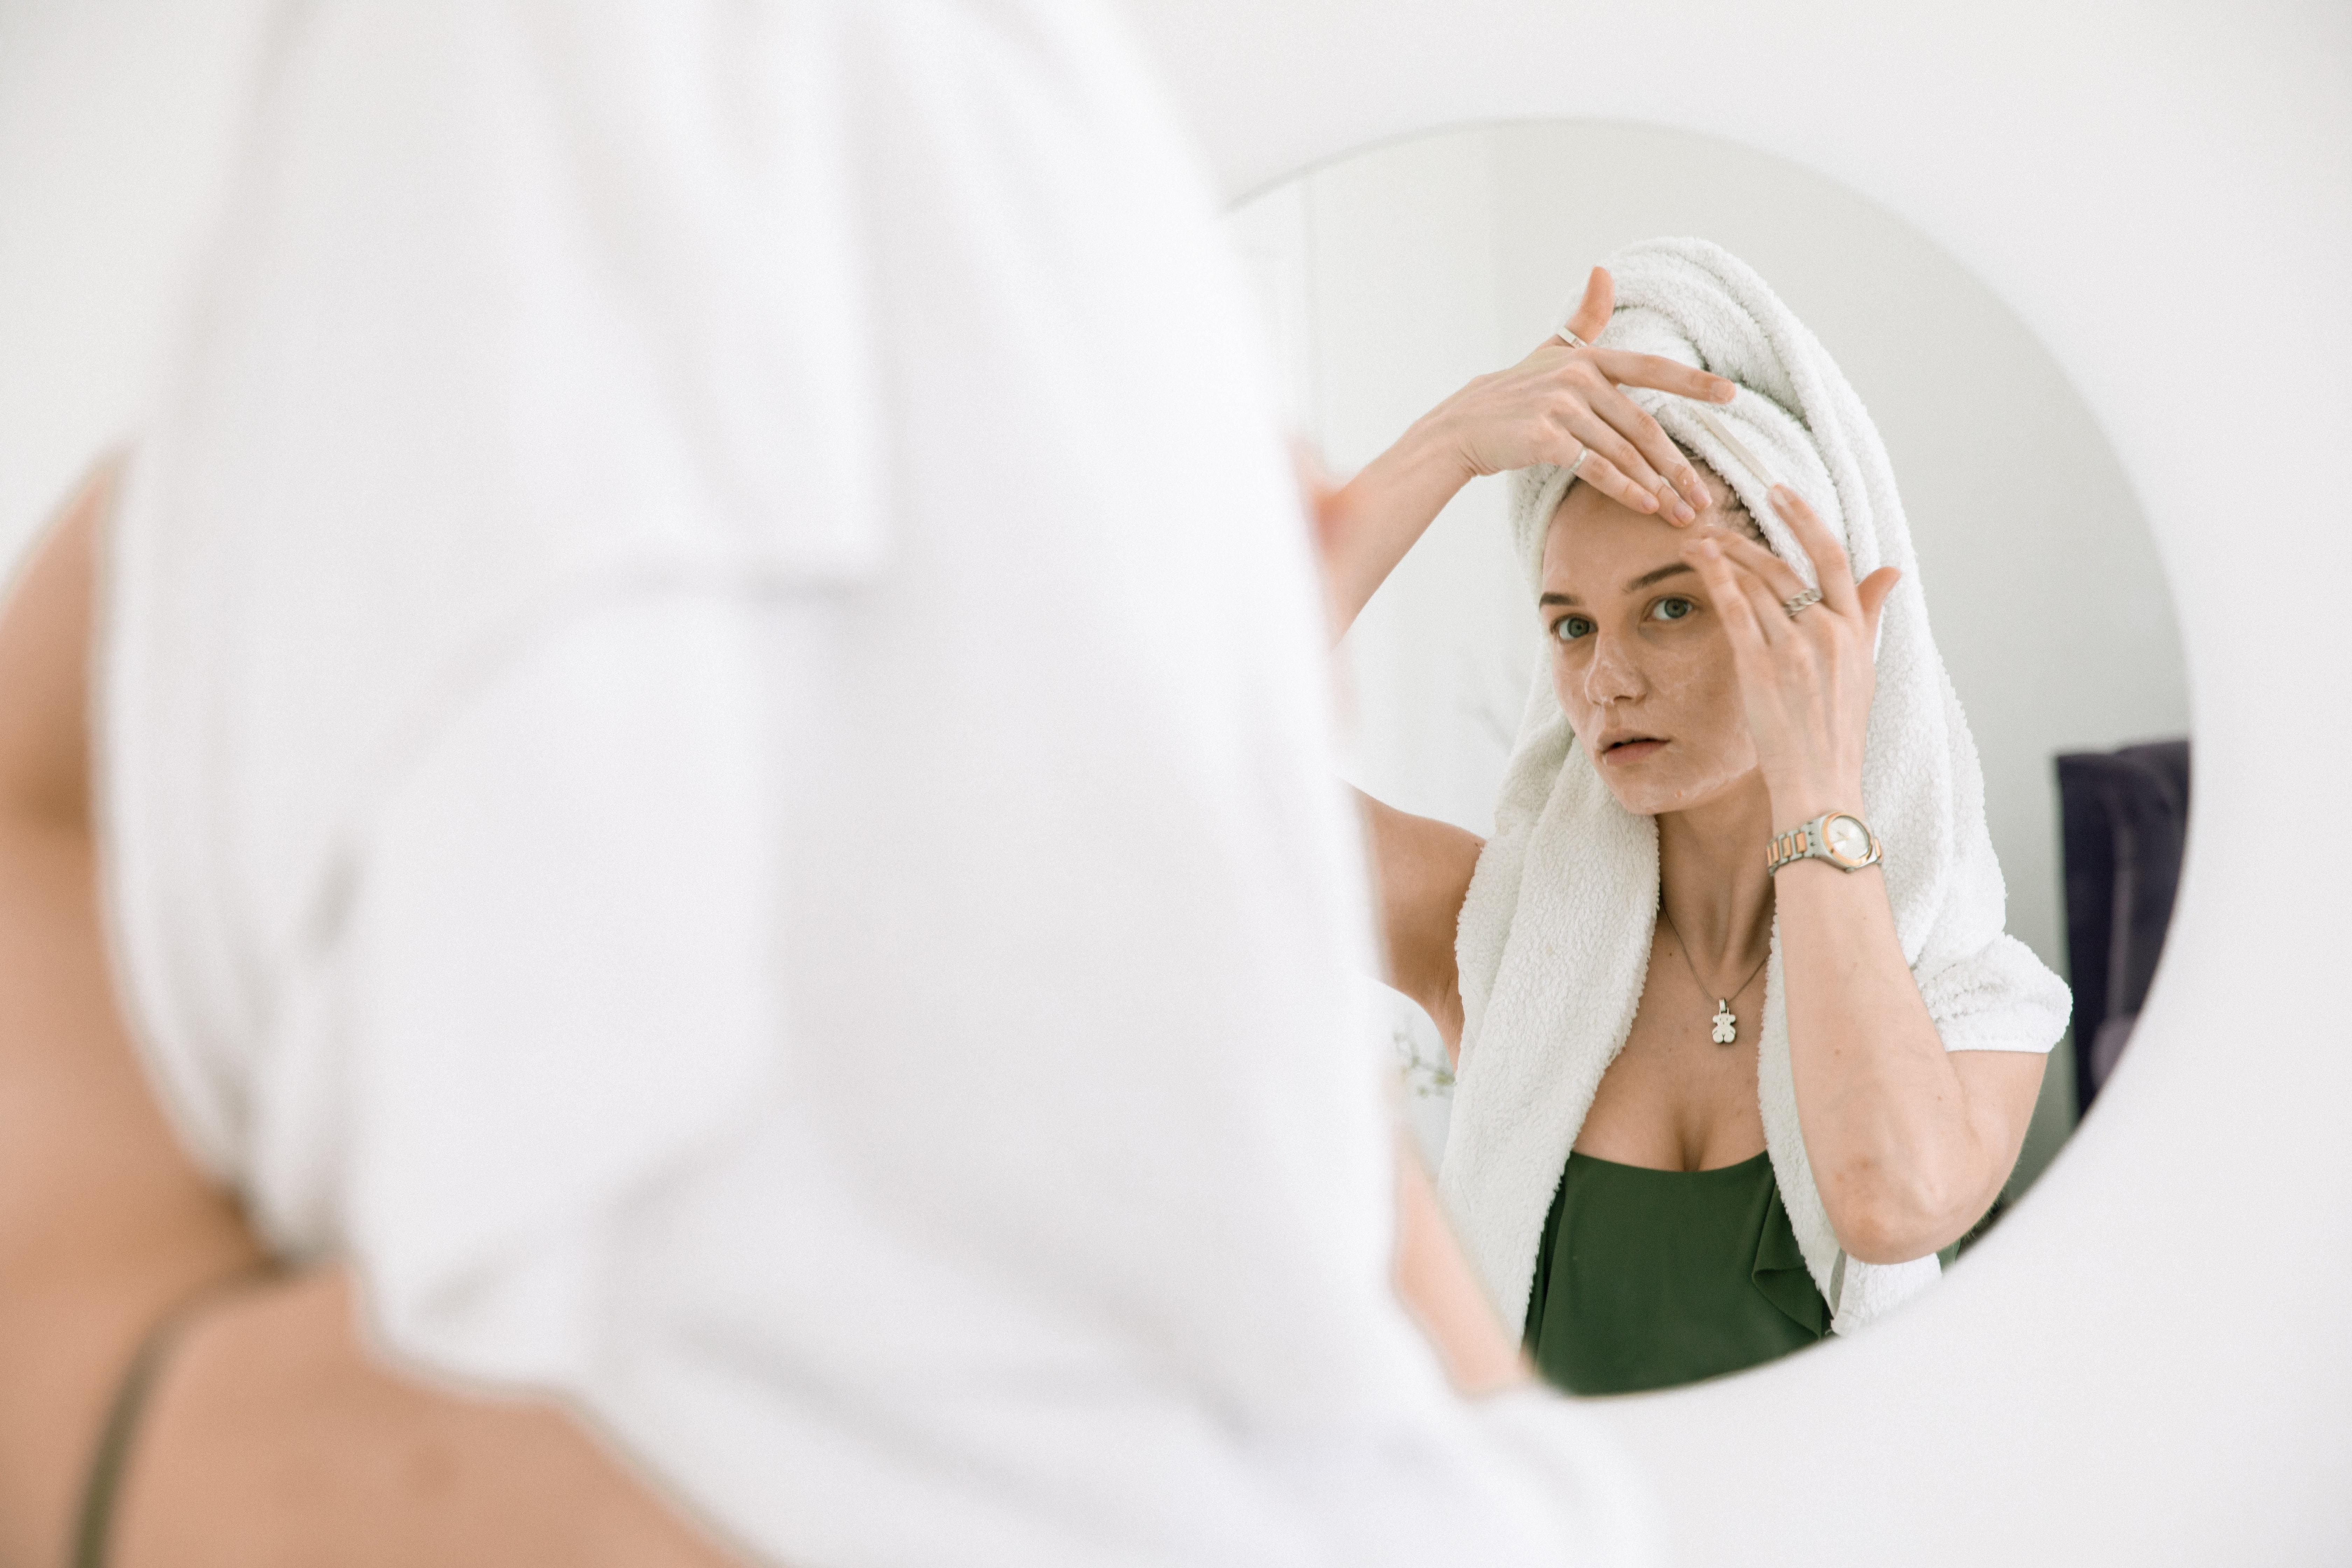 Šest loših navika u nezi kože